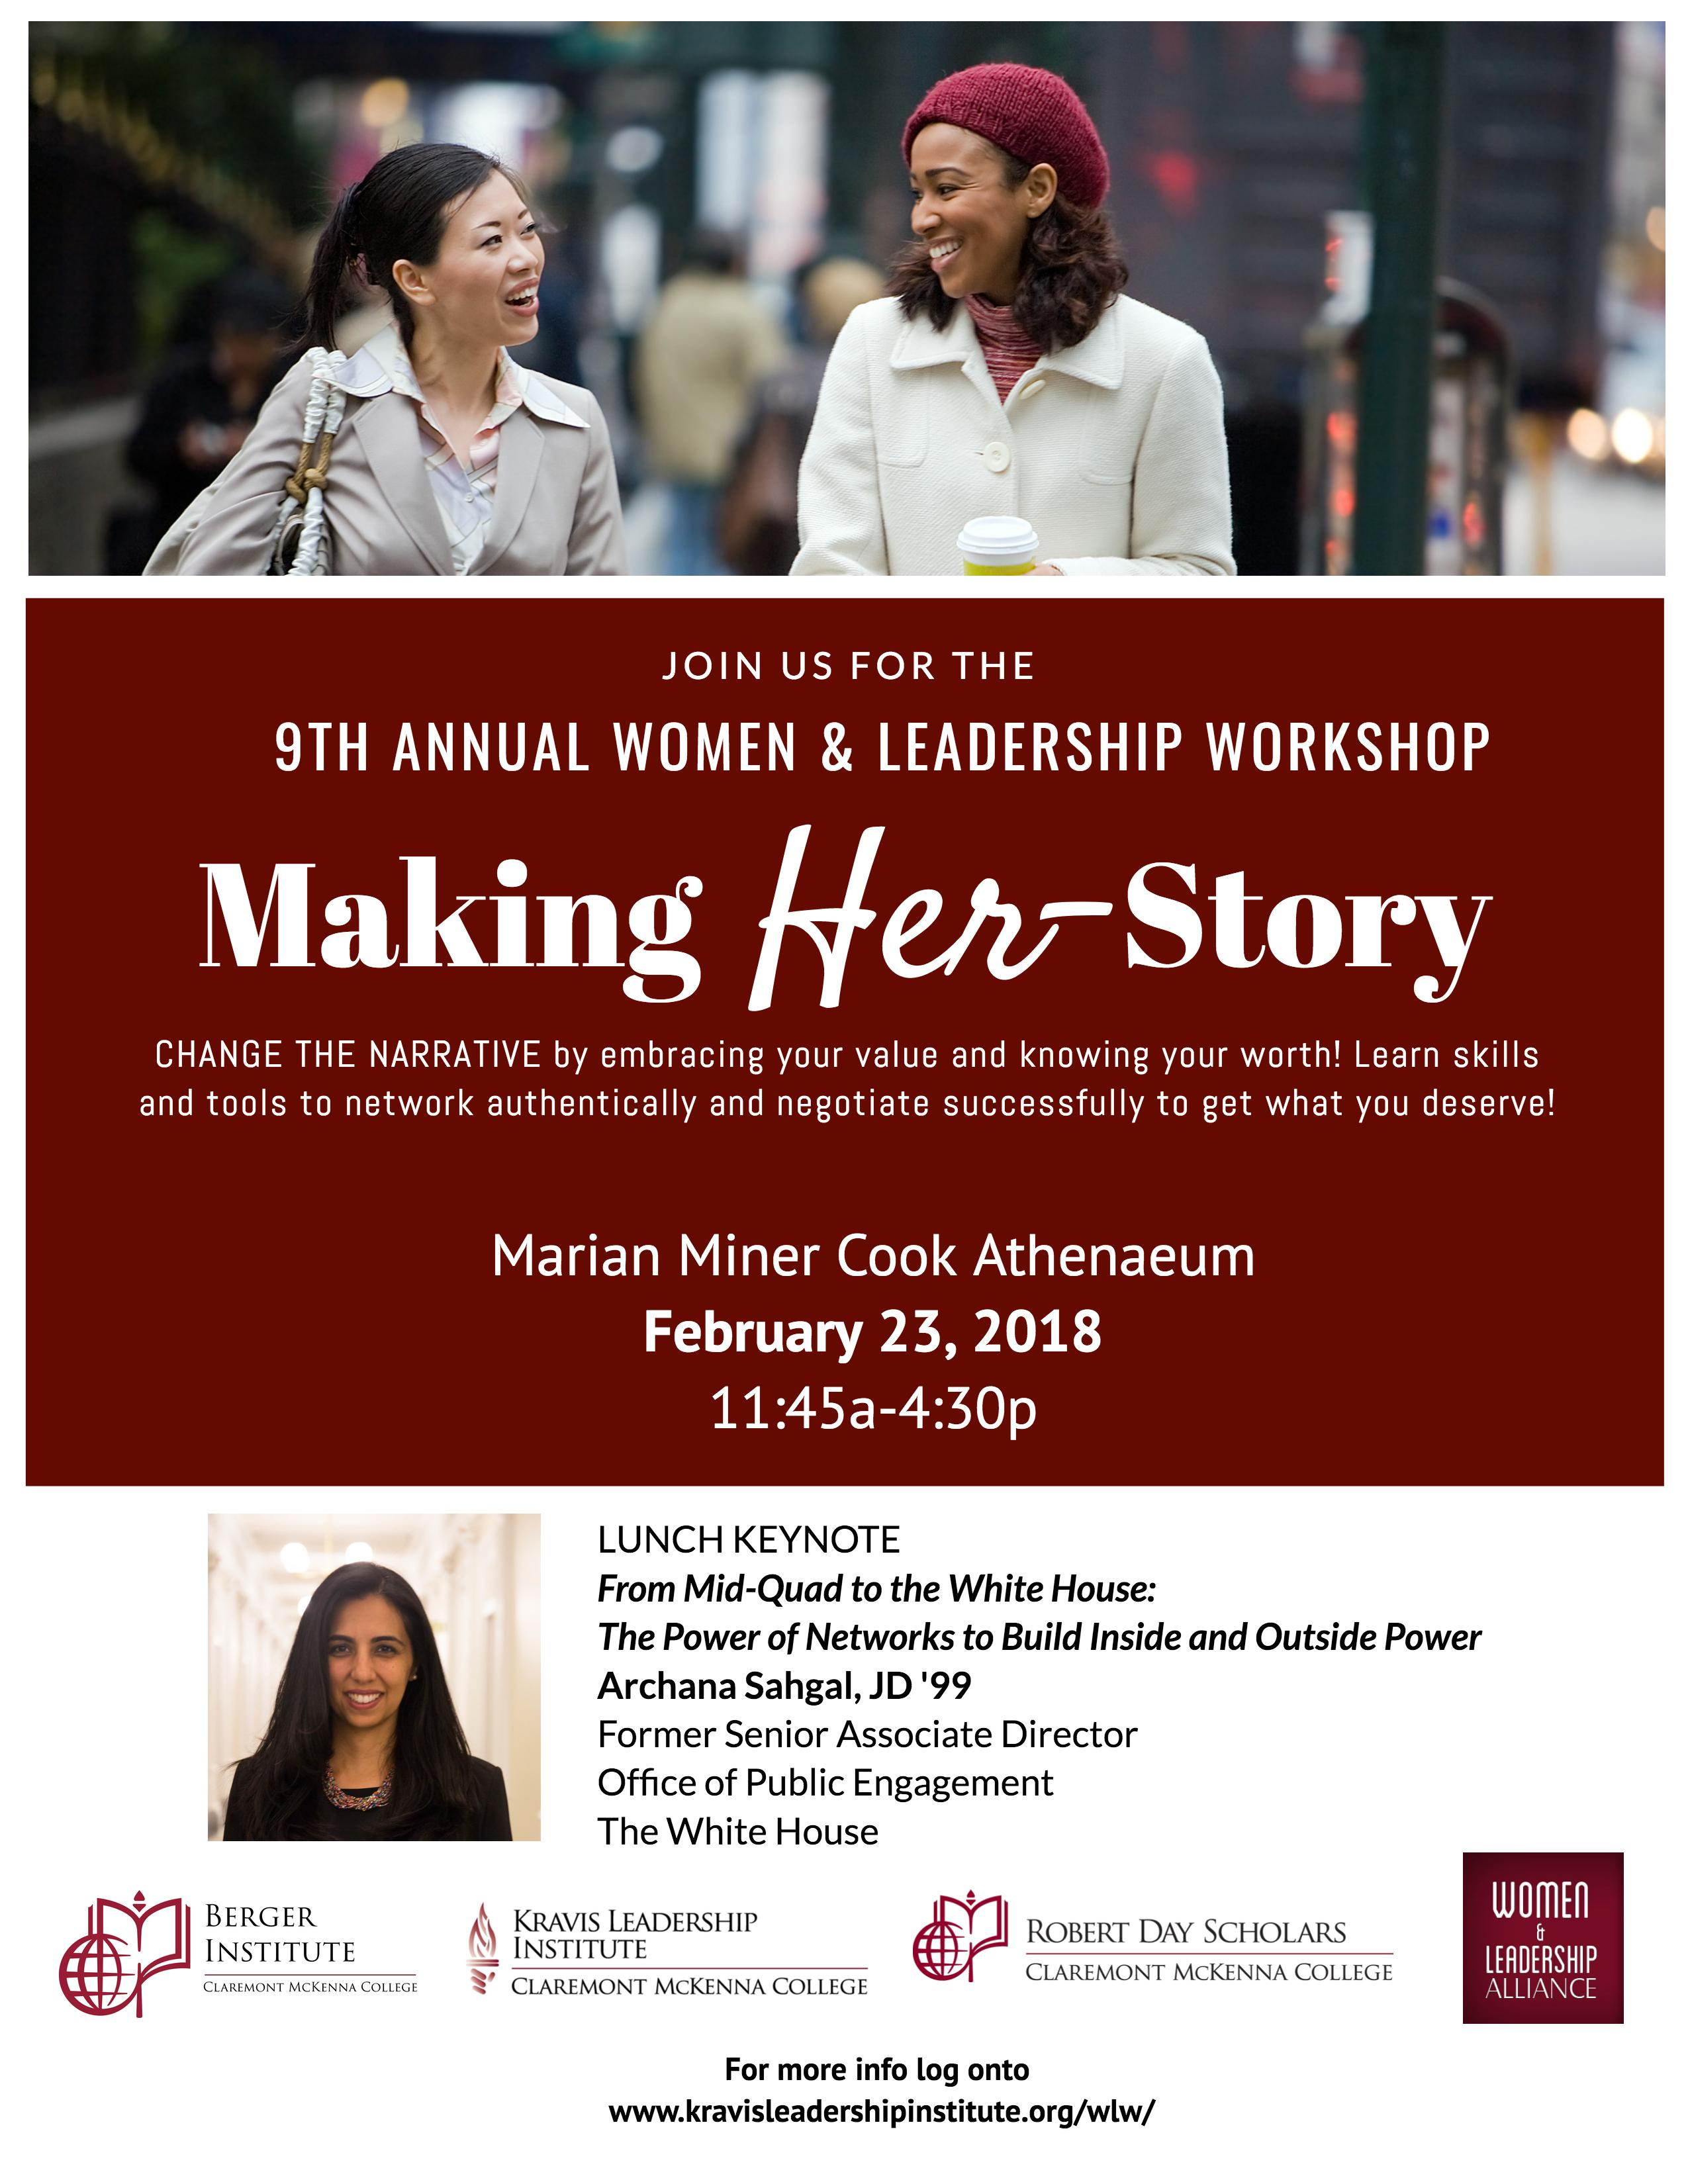 9th Annual Women & Leadership Workshop